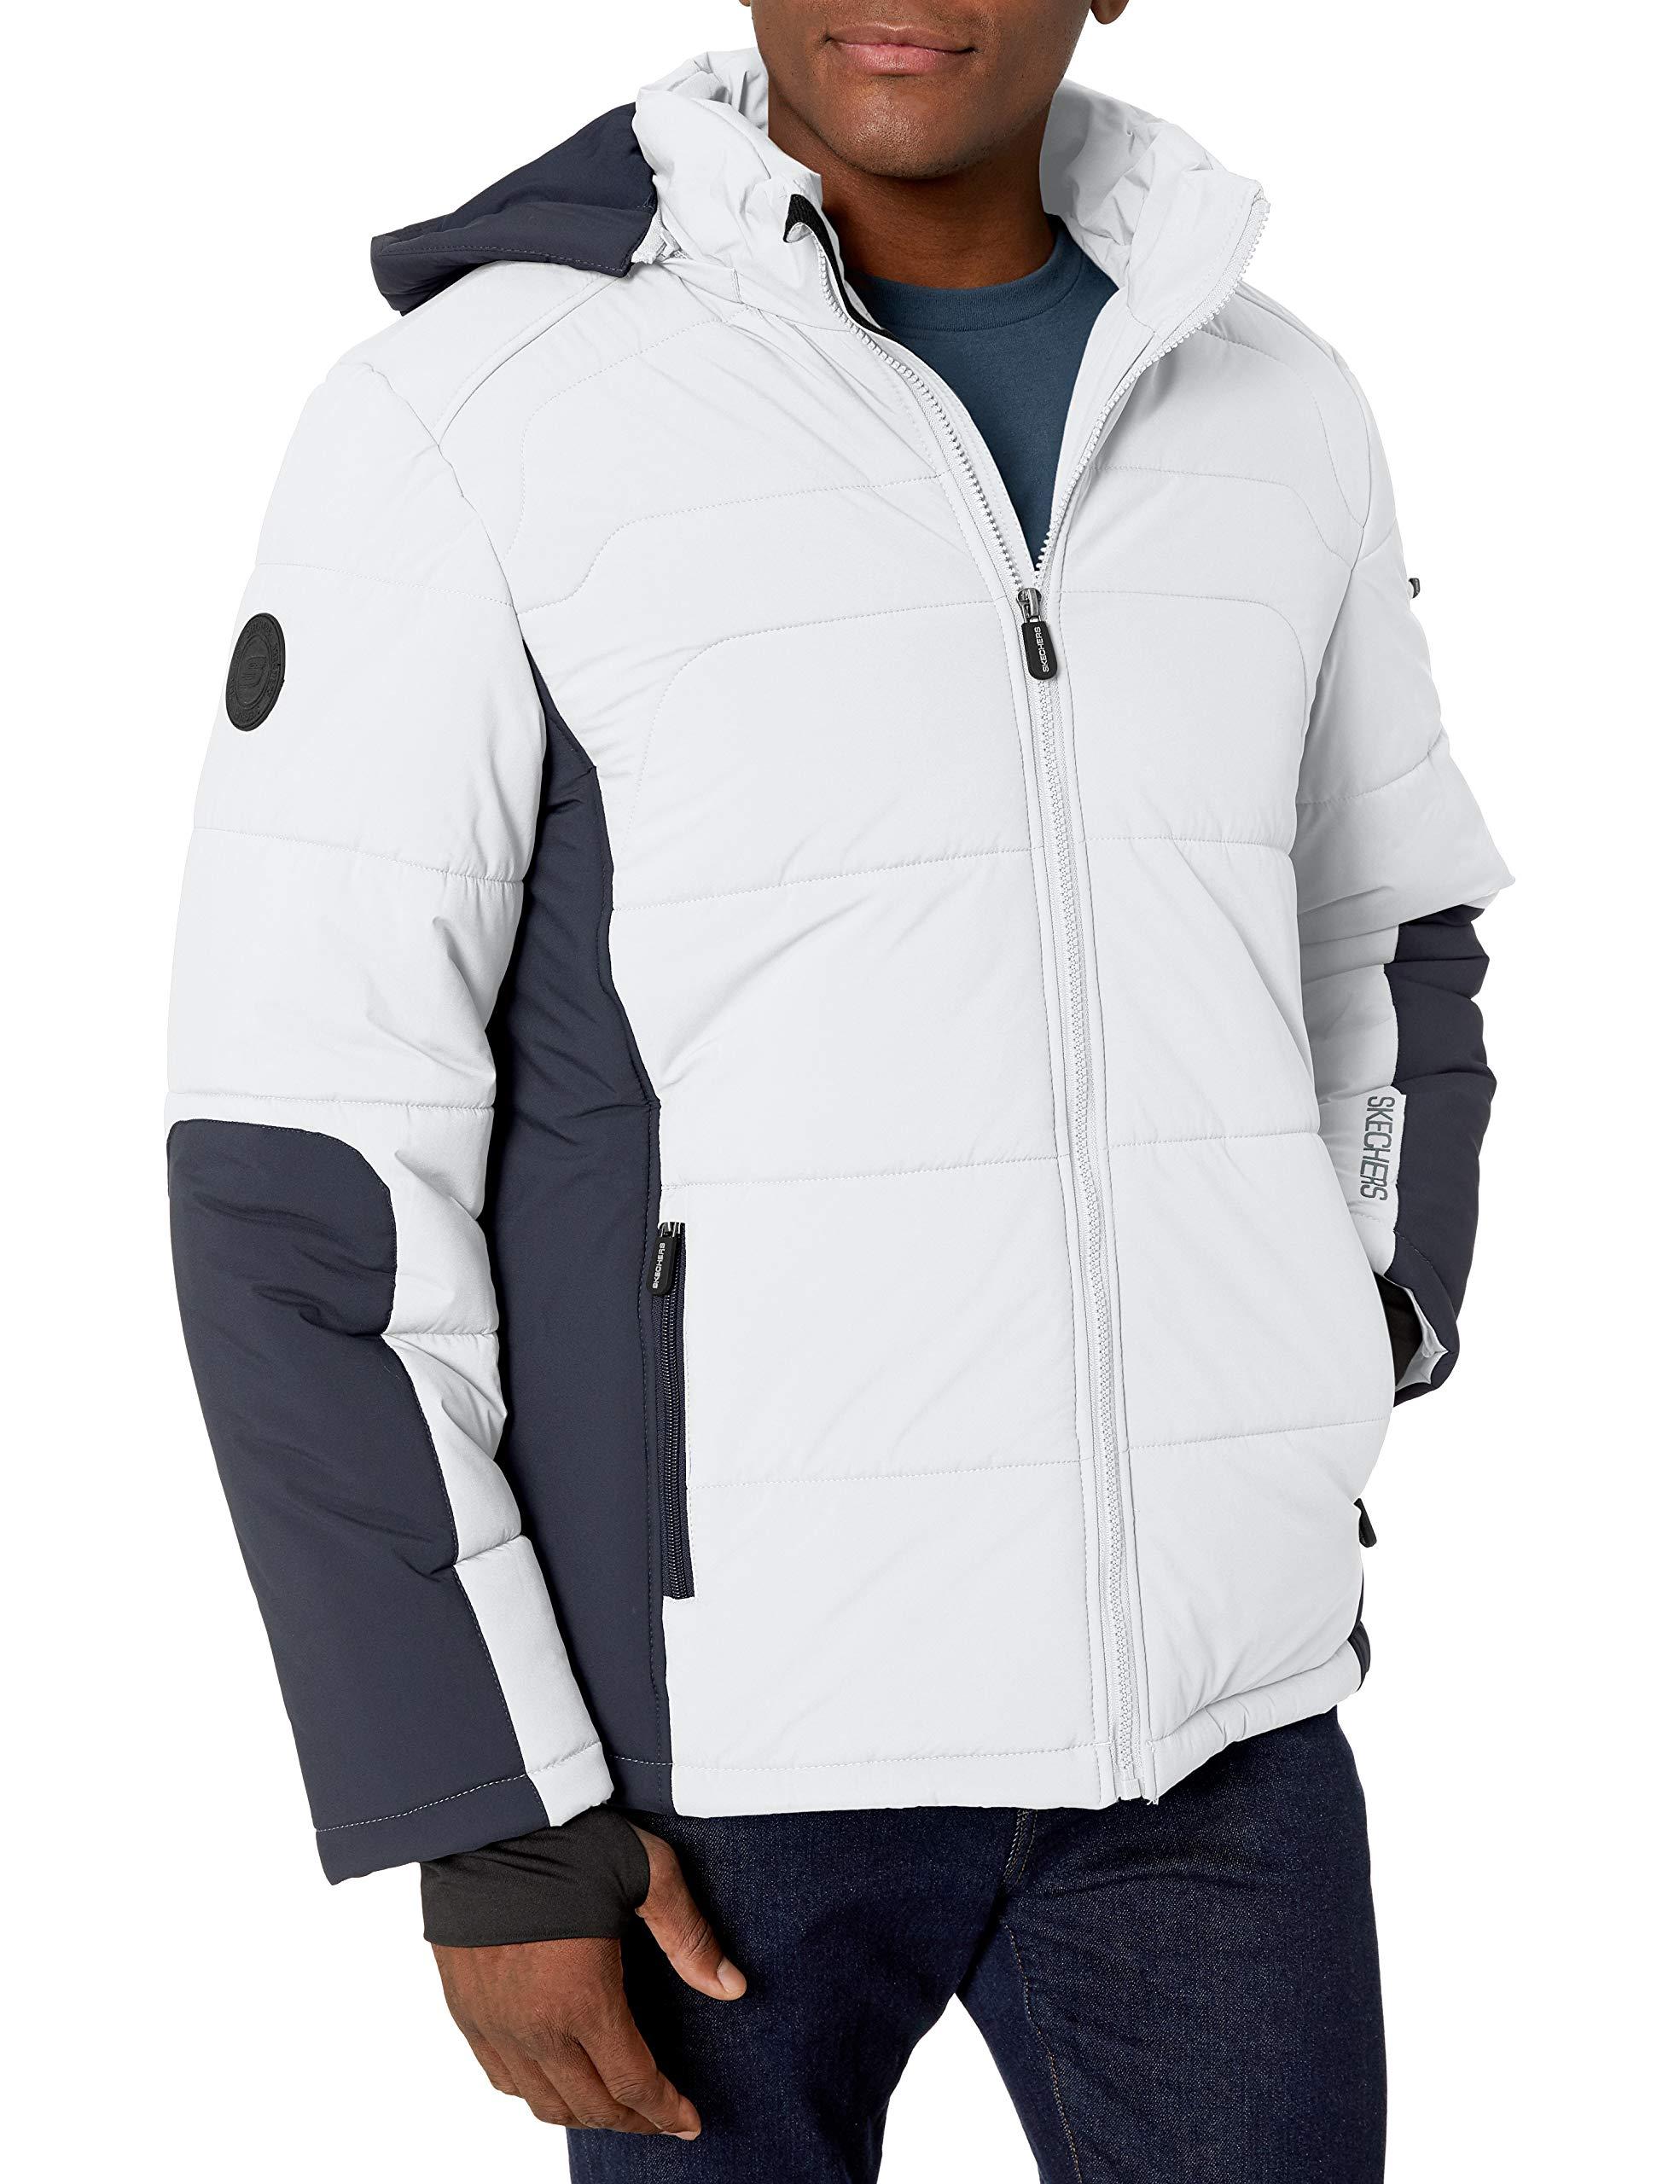 Skechers Men's Warm Puffer Jacket with Hood